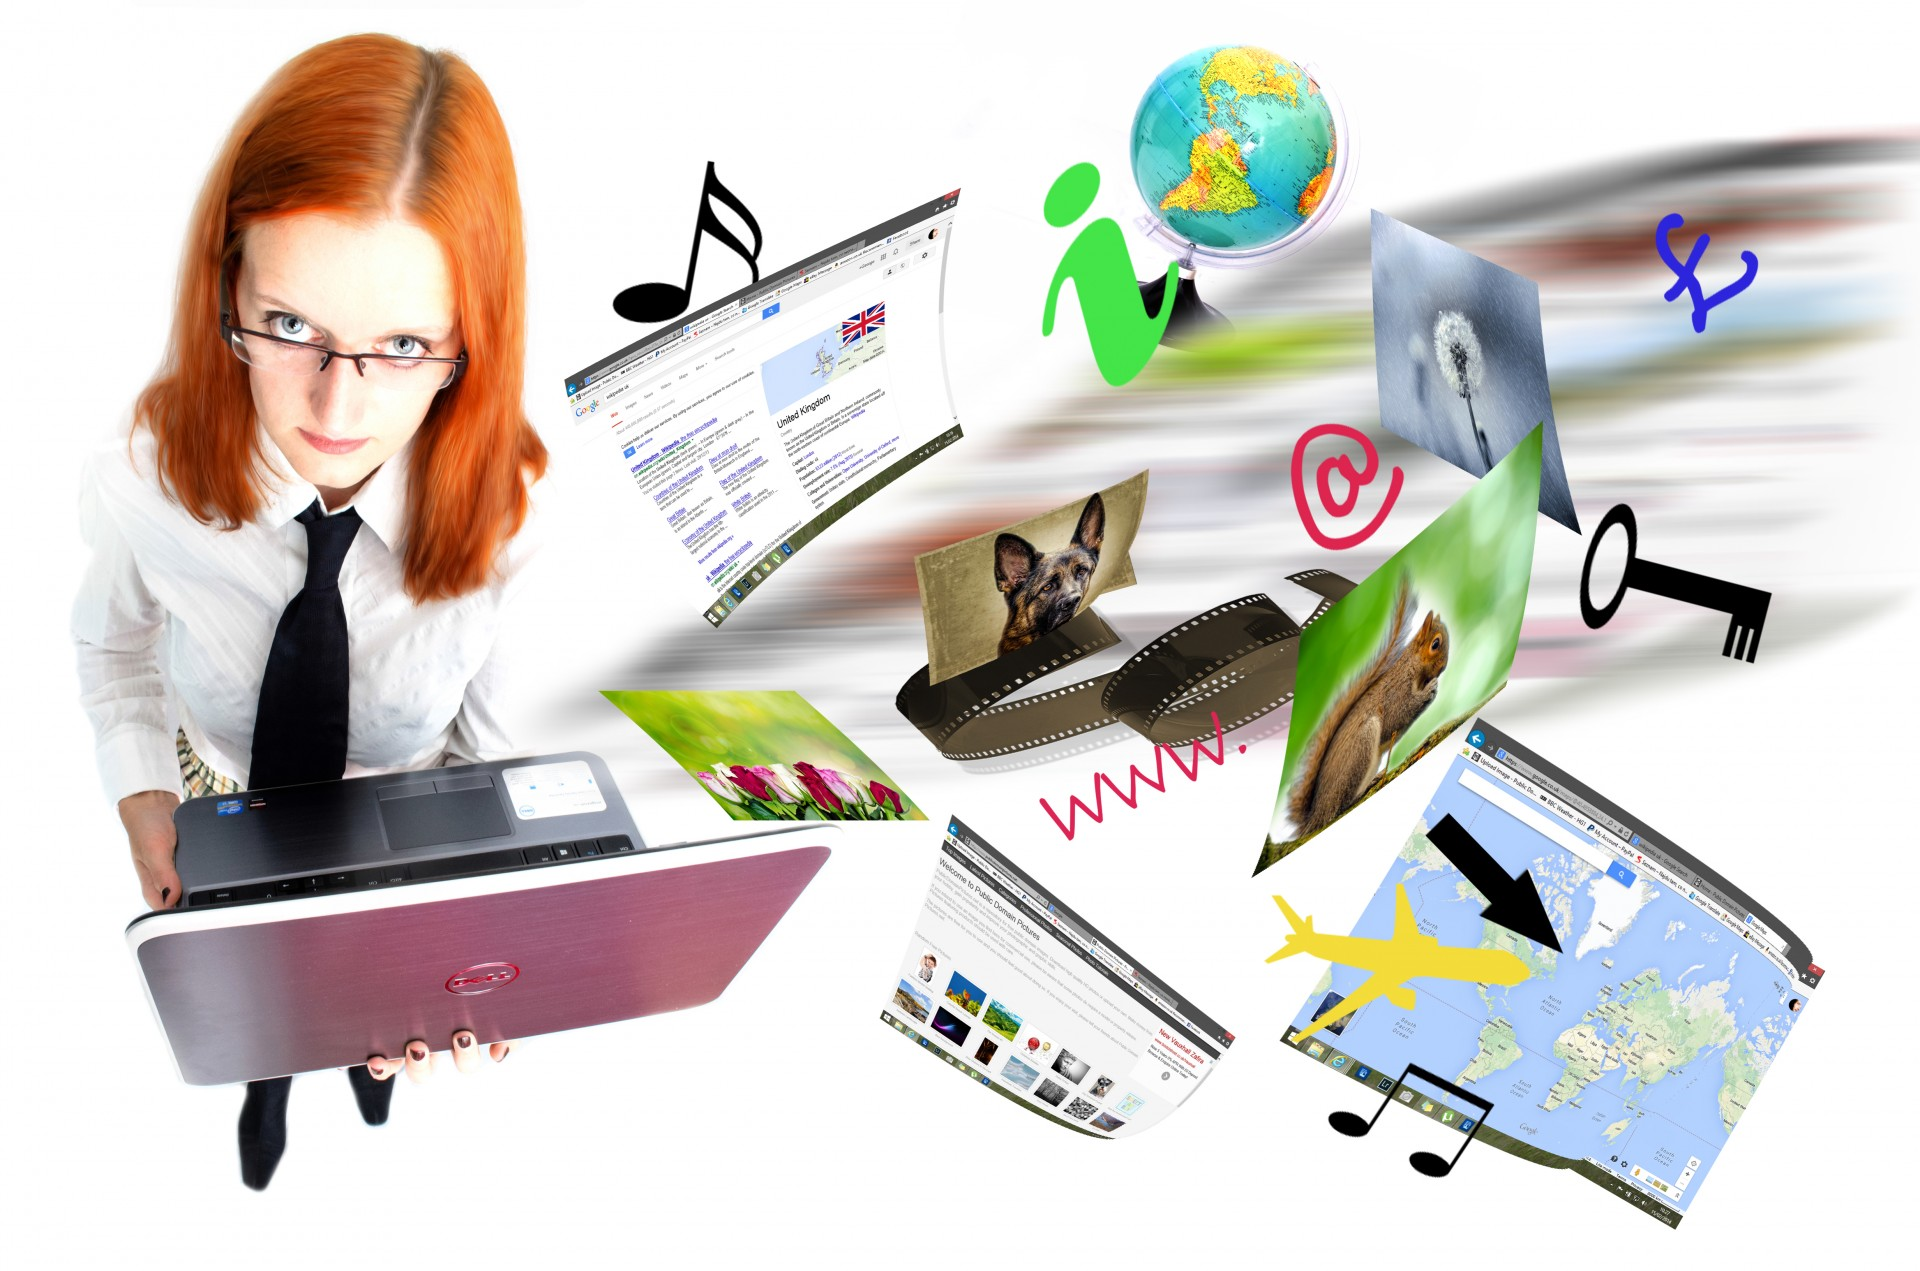 MultimediaInstruction